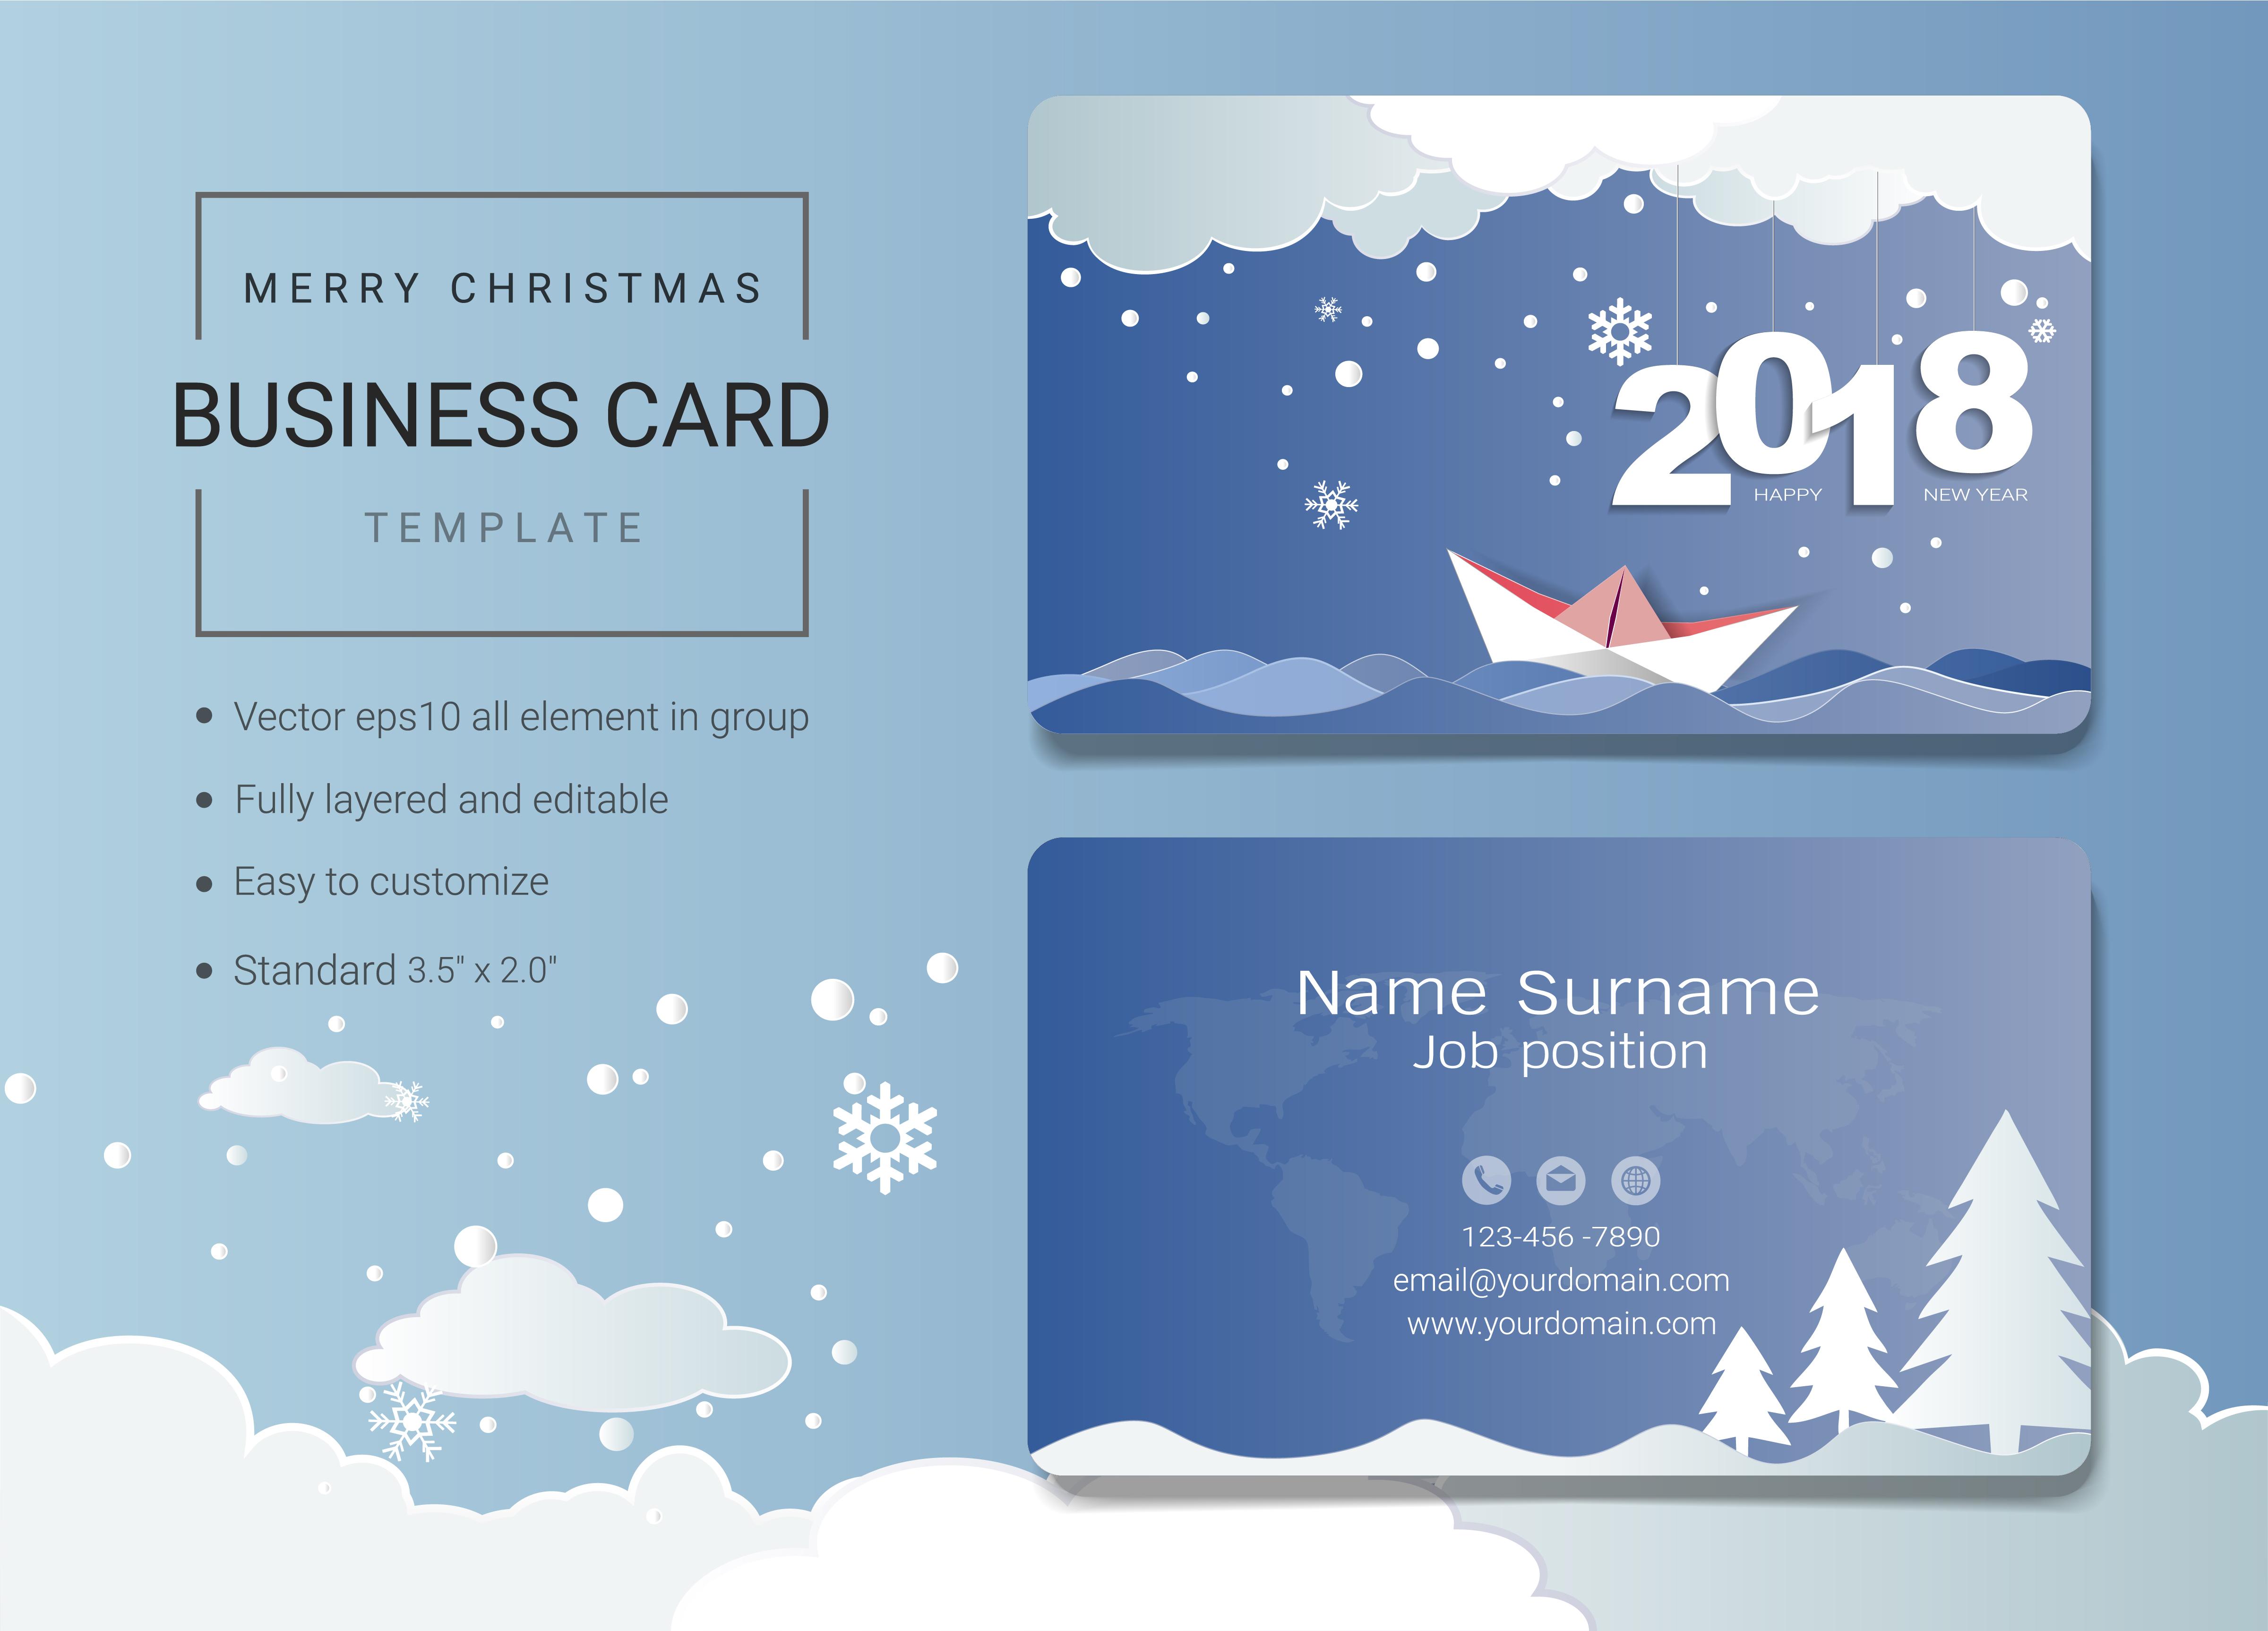 2018 merry christmas name card design template 528021